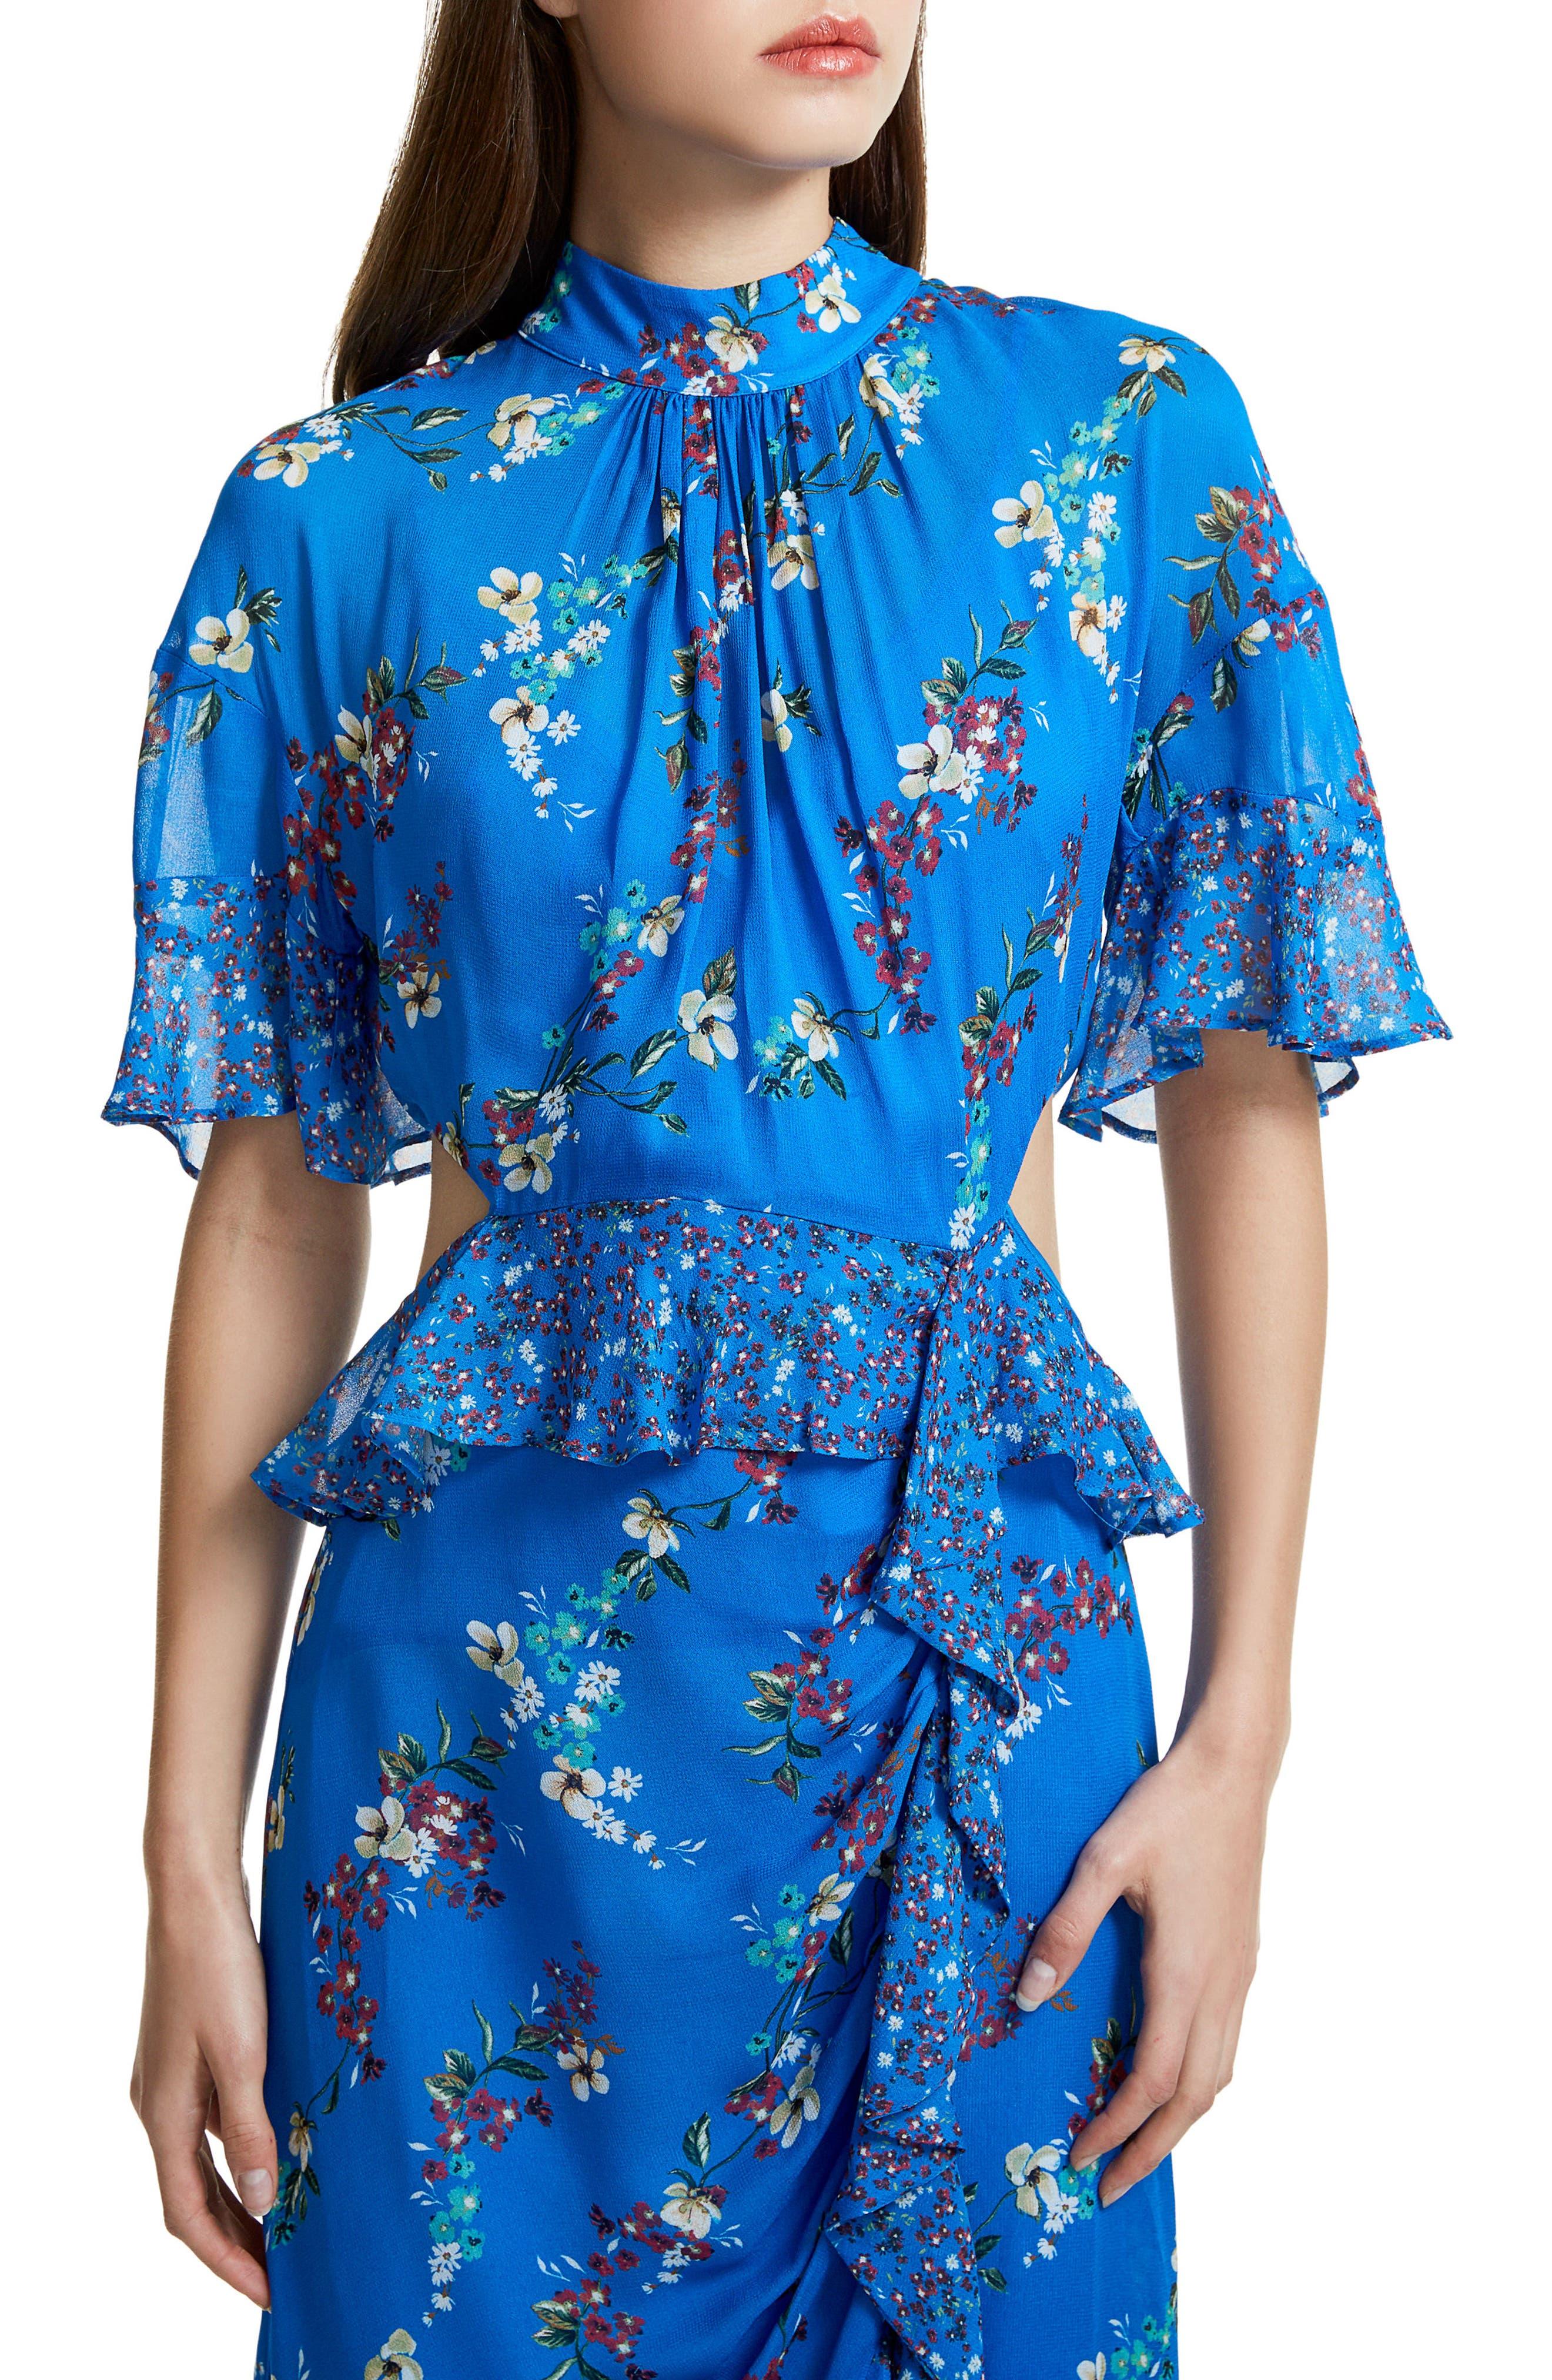 Melsa Cutout Maxi Dress,                             Alternate thumbnail 4, color,